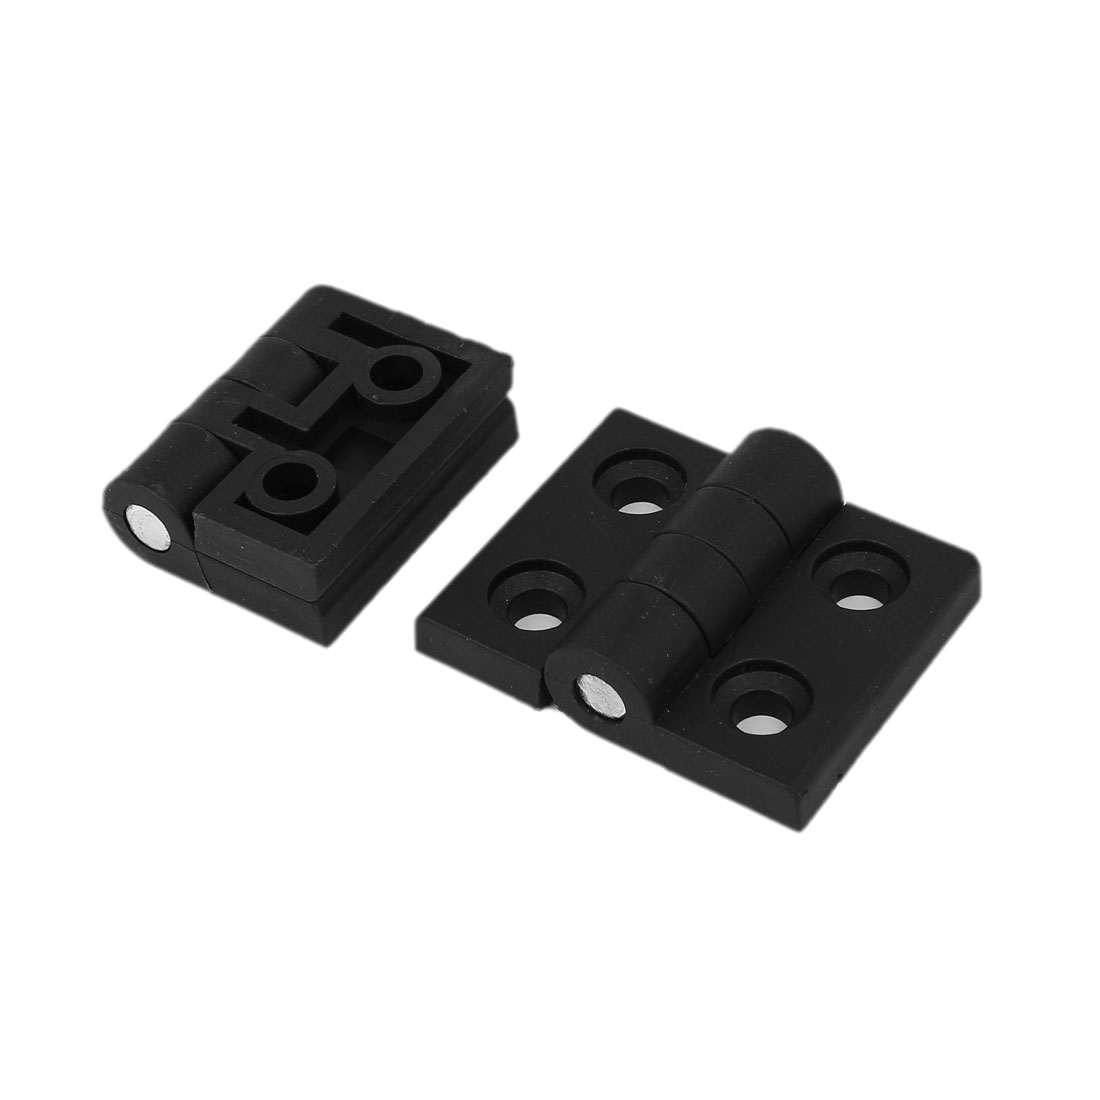 57mm x 45mm x 15mm Plastic 270 Degree Door Bearing Hinge Black 2pcs